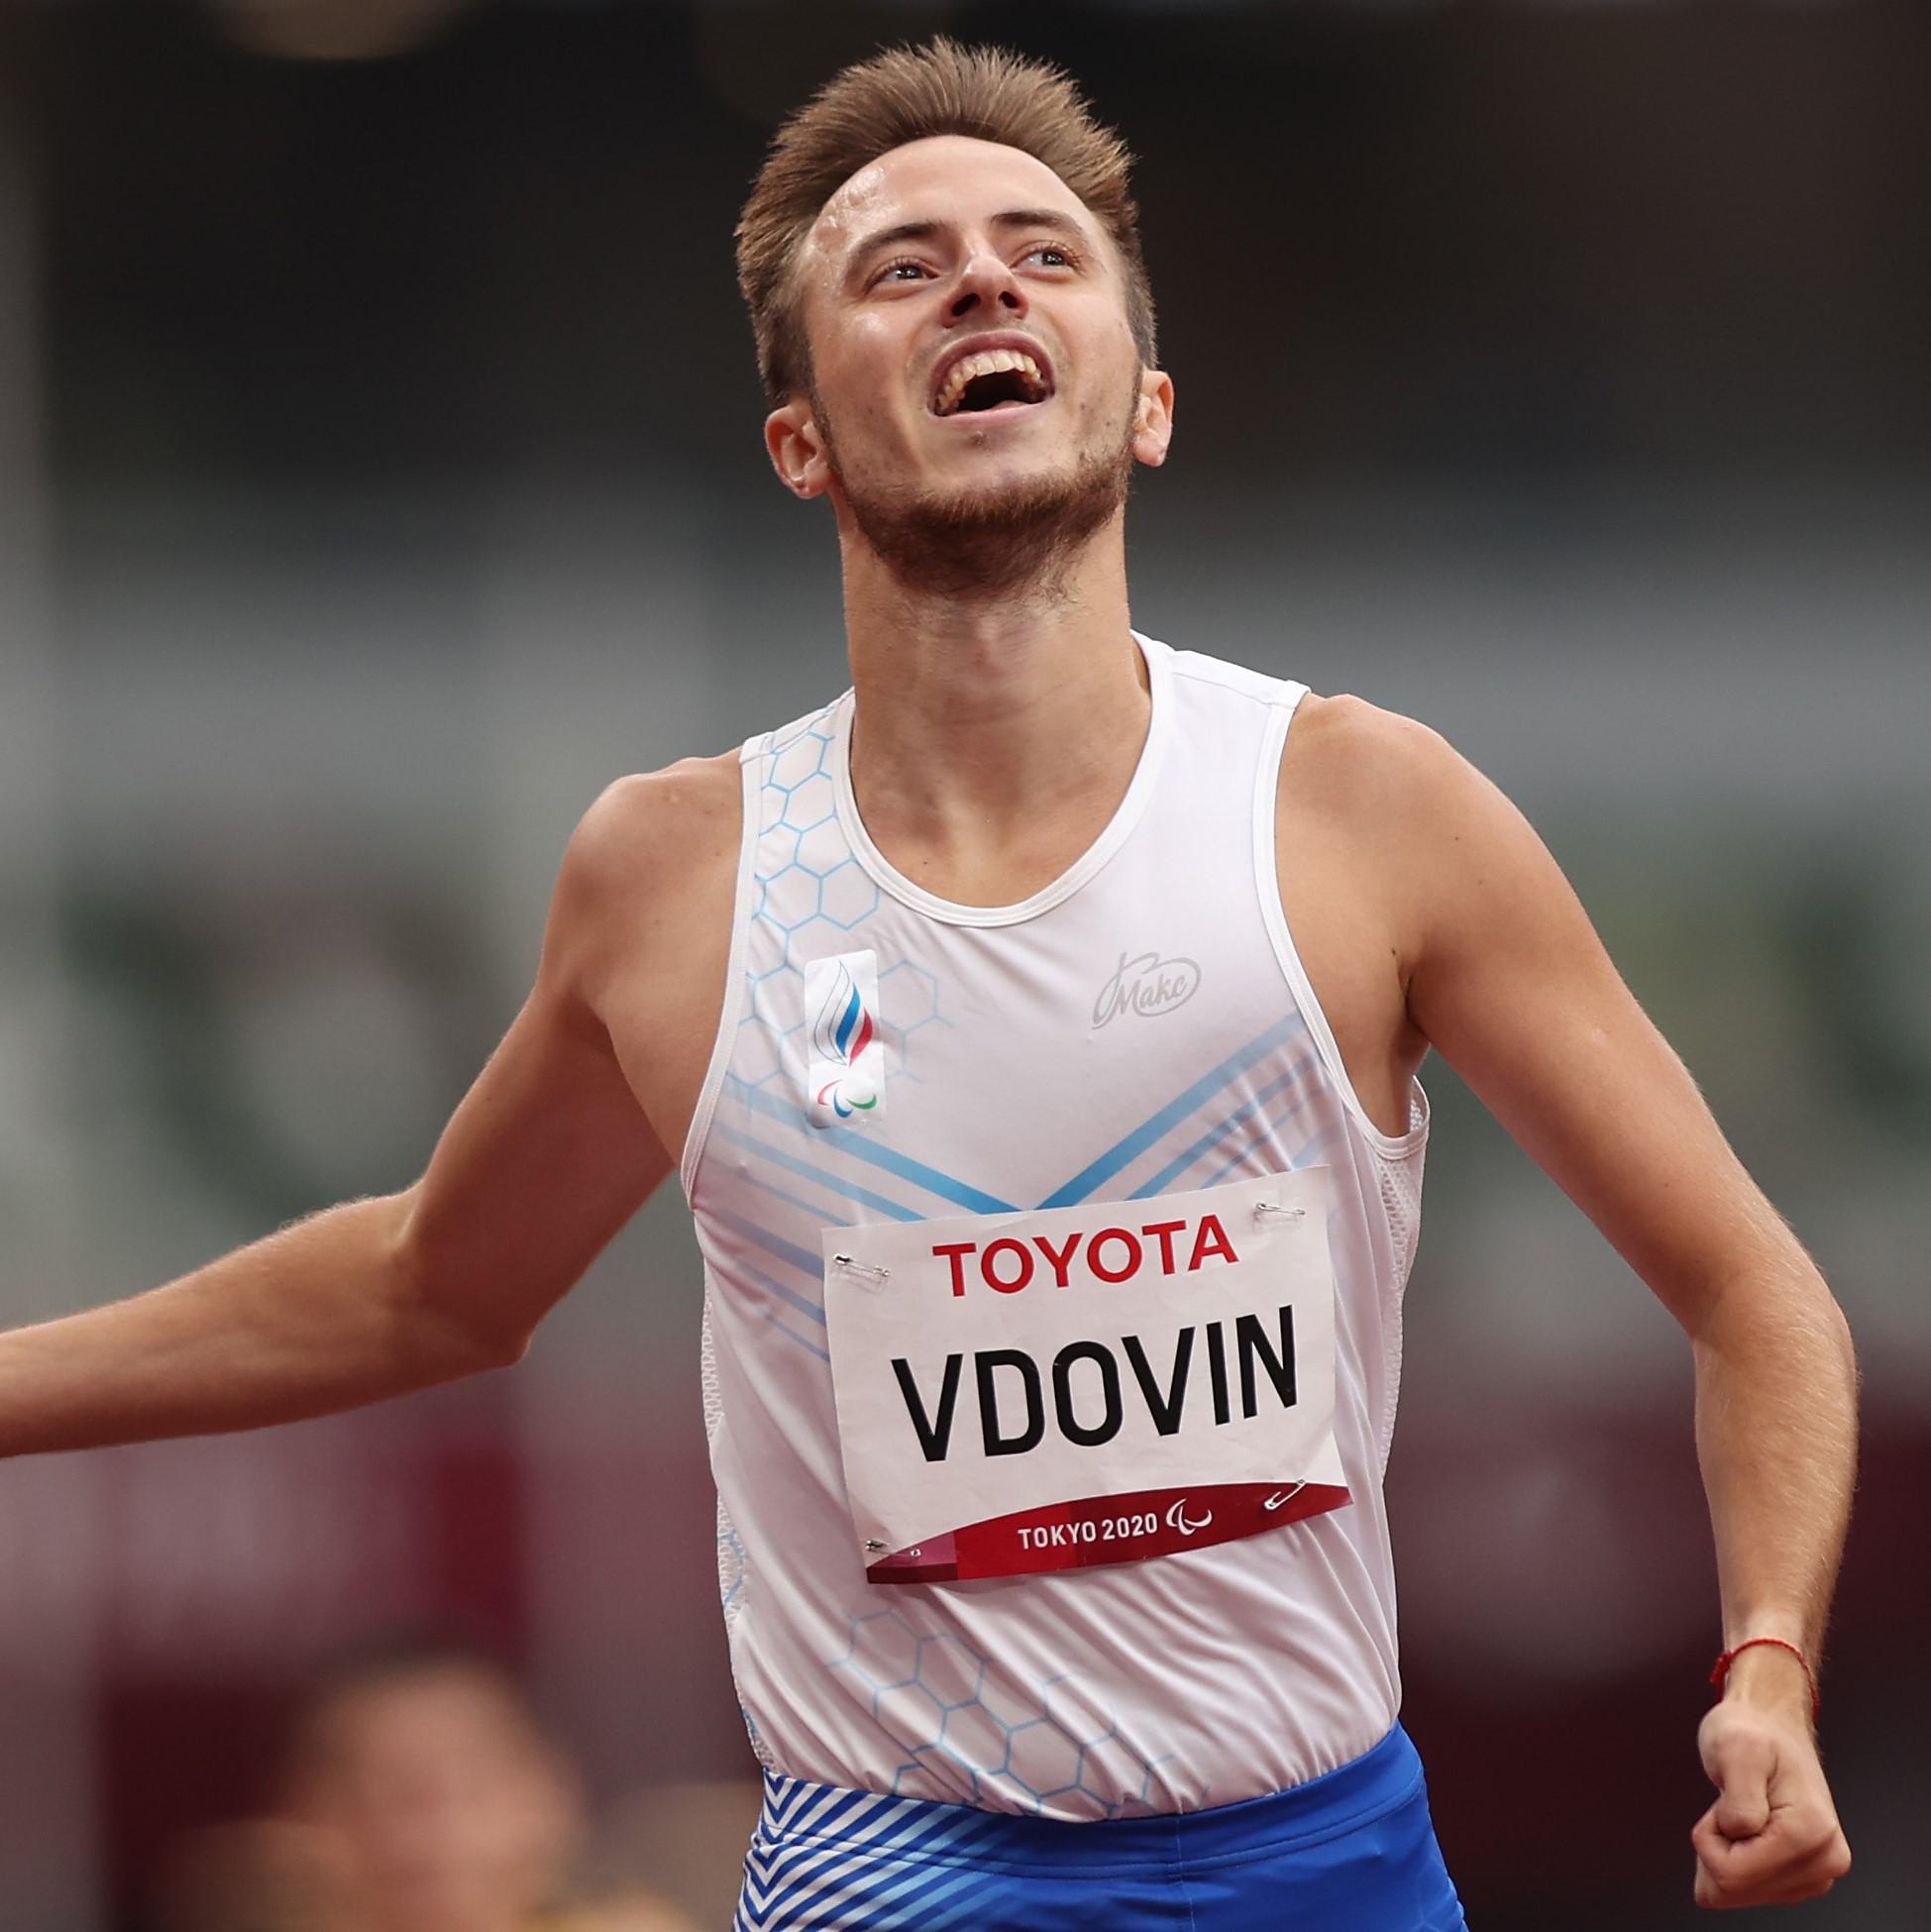 Andrei Vdovin